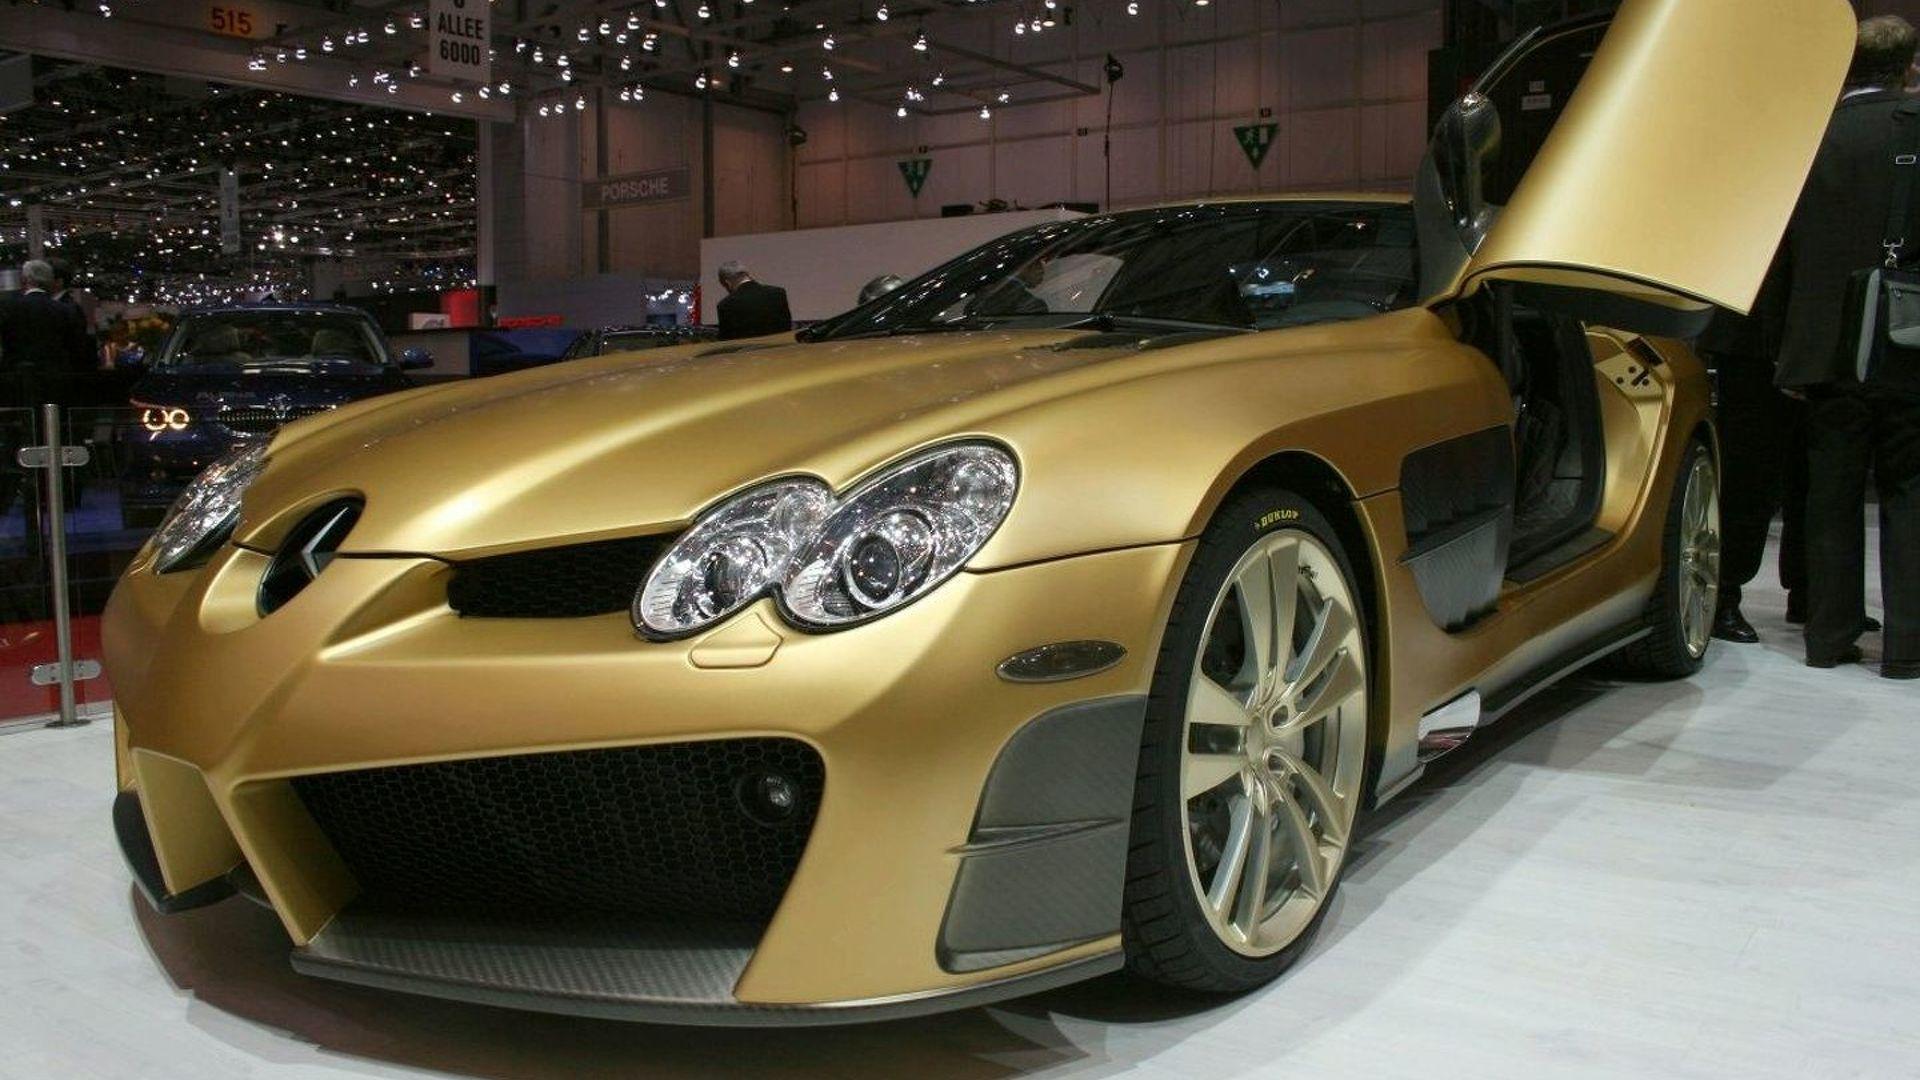 MANSORY Renovatio based on Mercedes-Benz Mclaren SLR